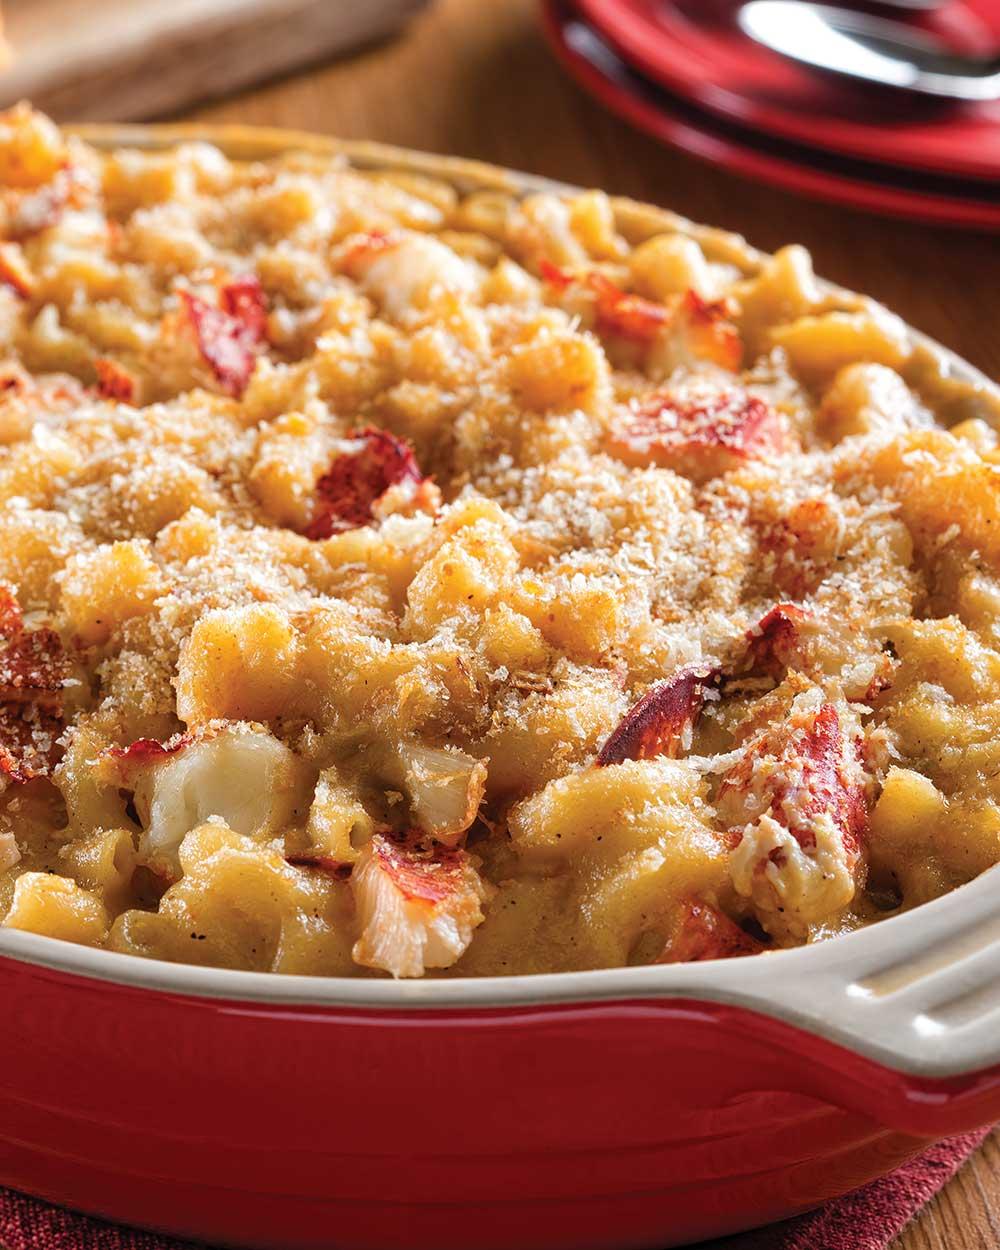 Cheesy Baked Macaroni and Cheese